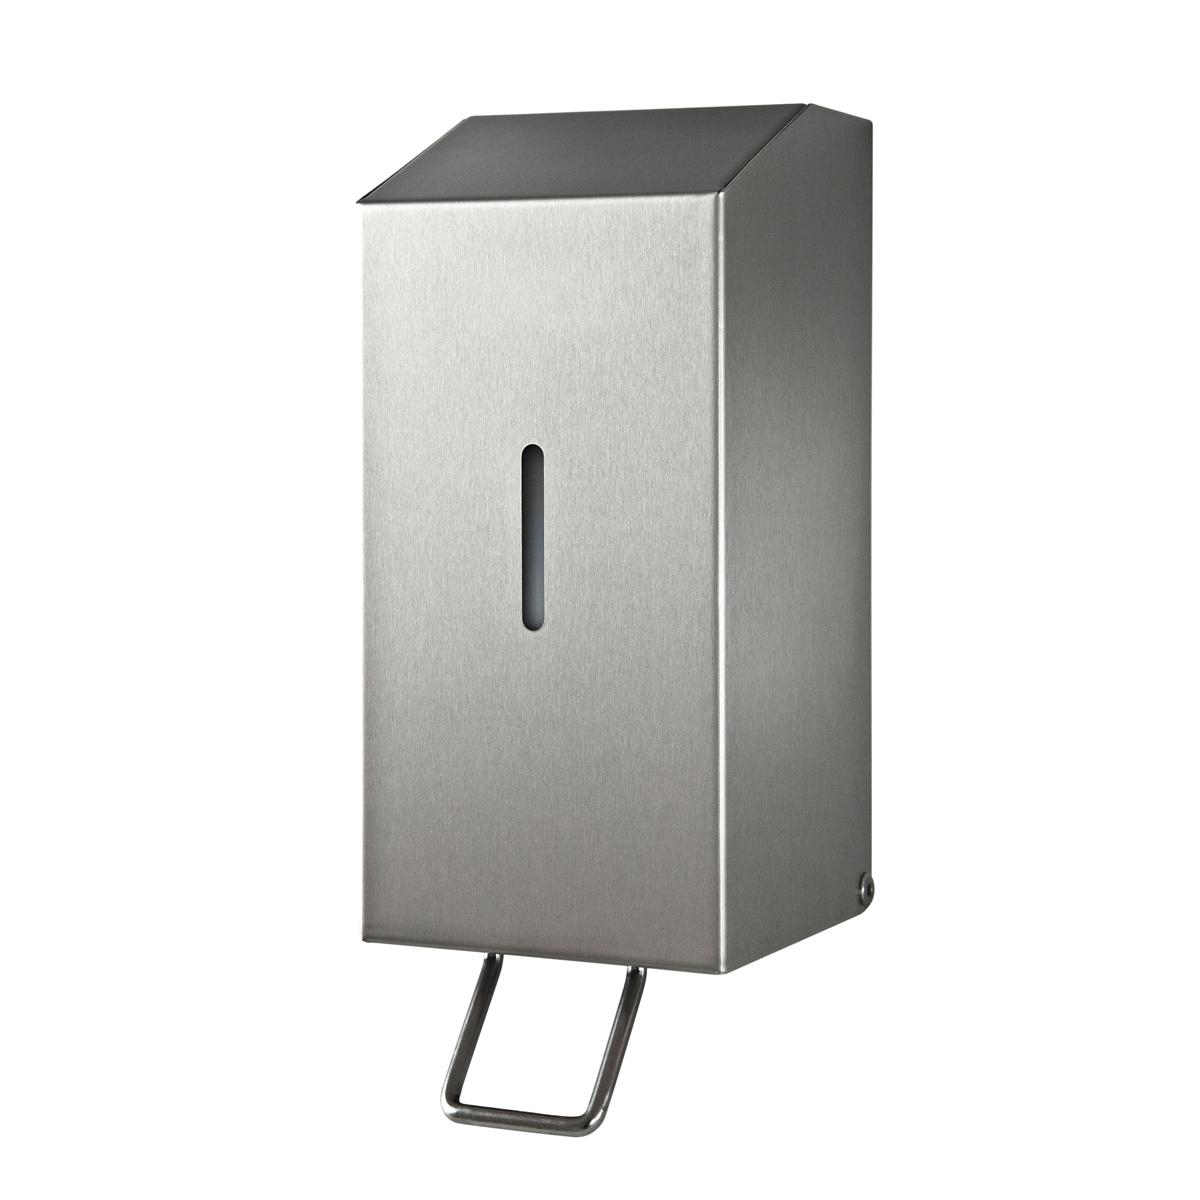 racon x80 seifenspender temca gmbh co kg. Black Bedroom Furniture Sets. Home Design Ideas